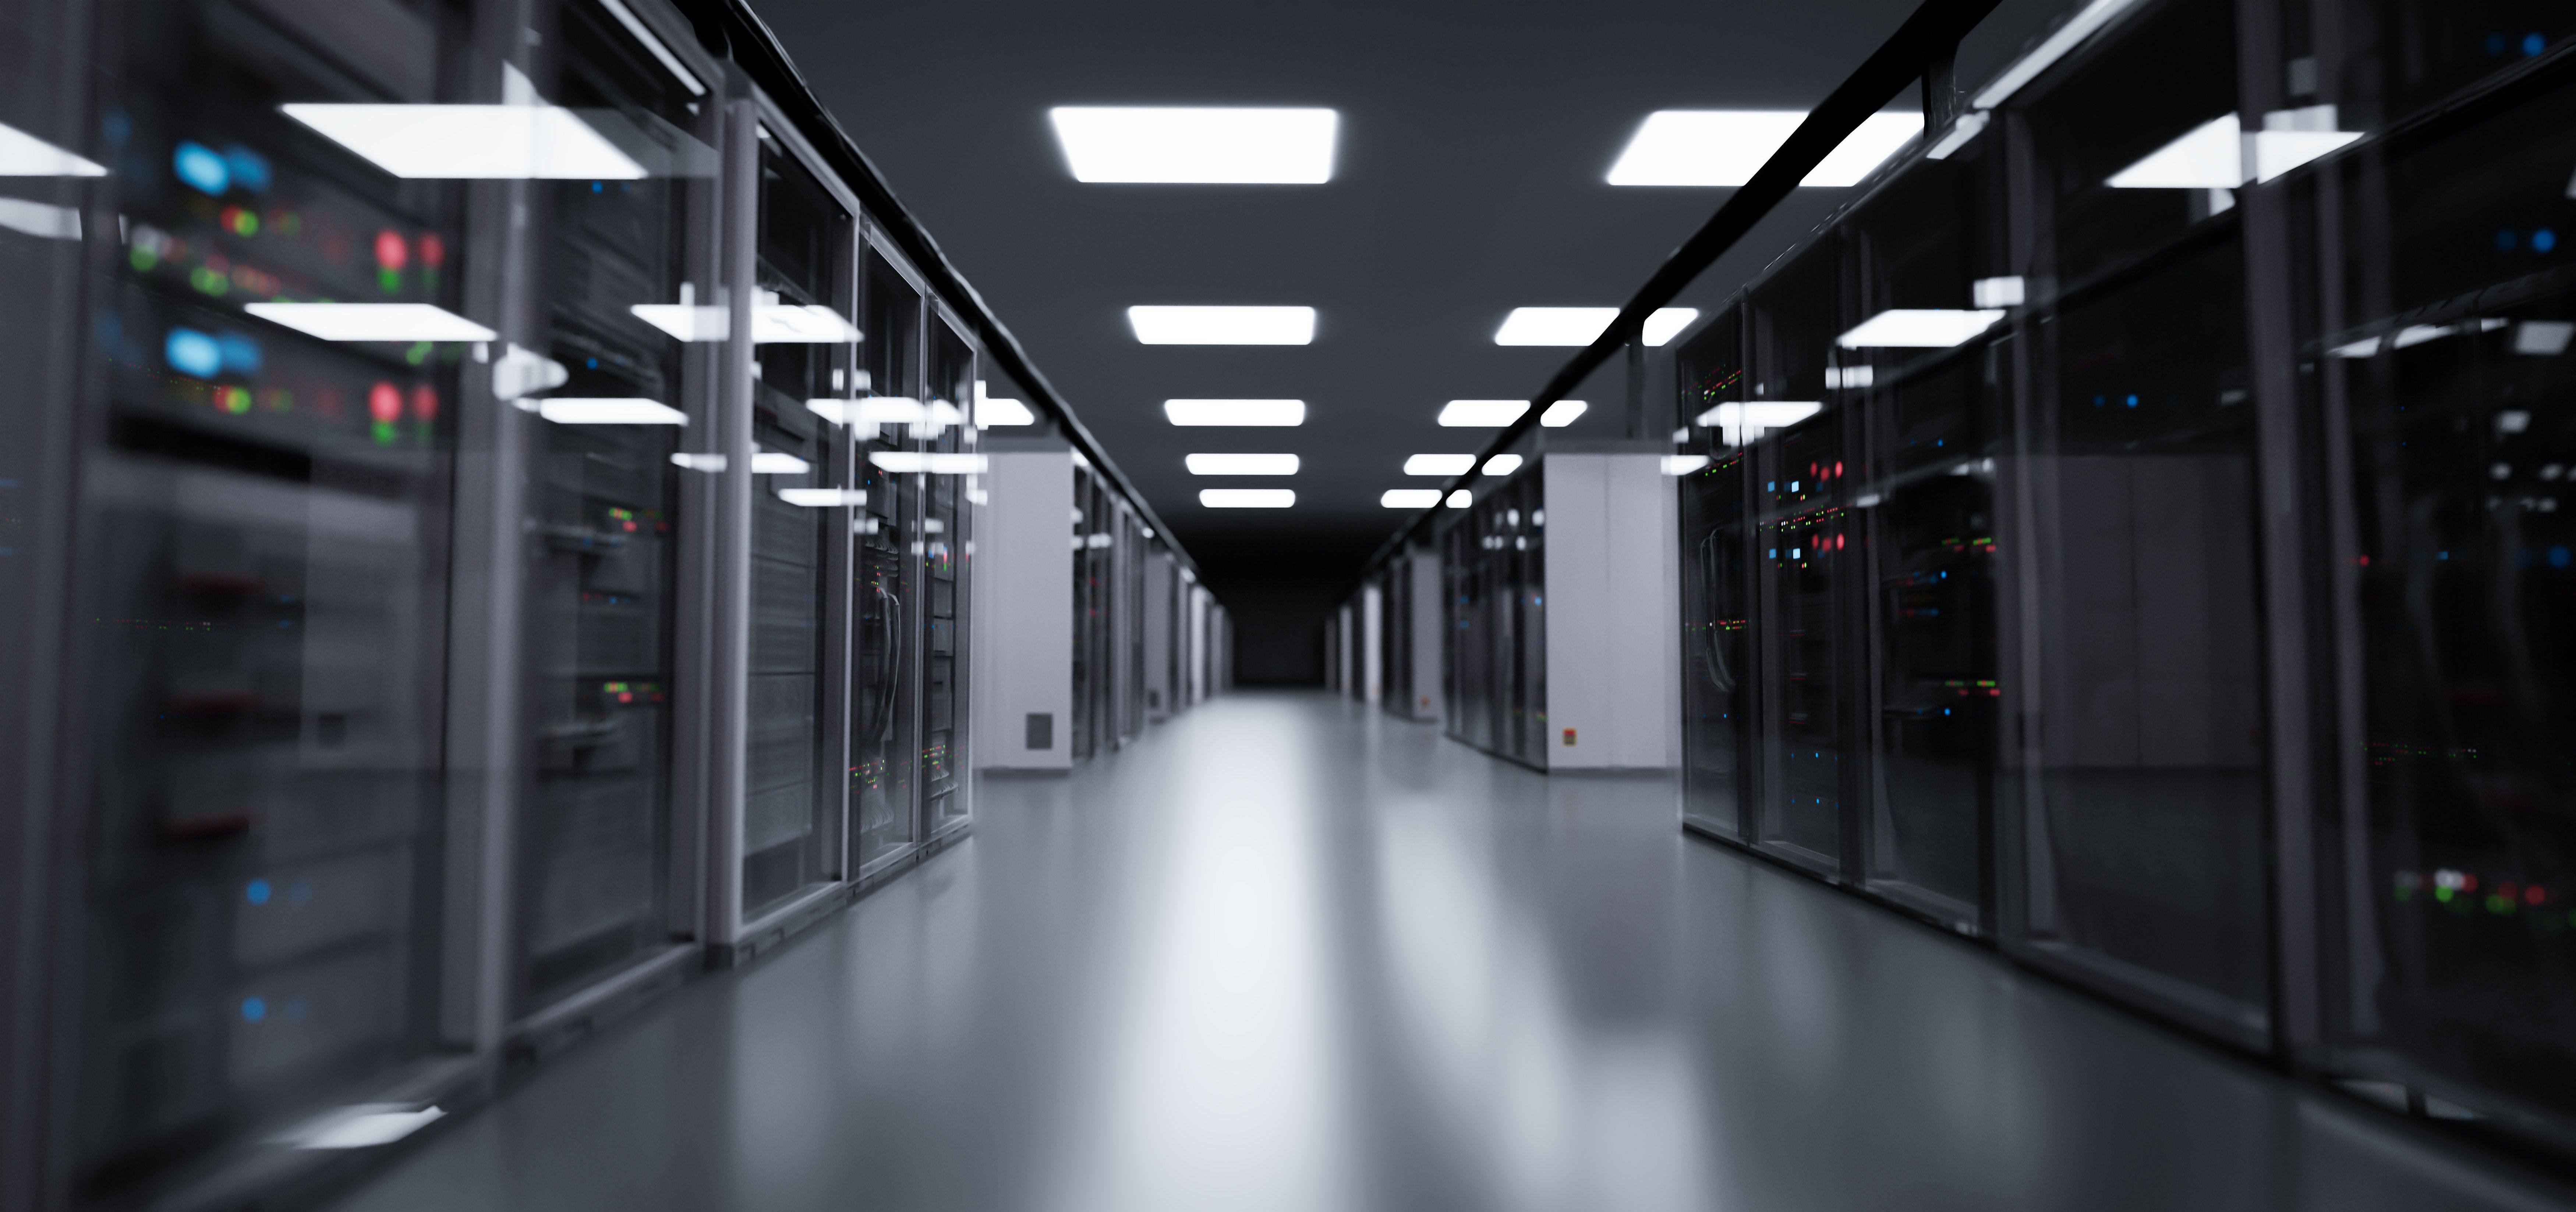 security-risk-server-room-modern-data-center